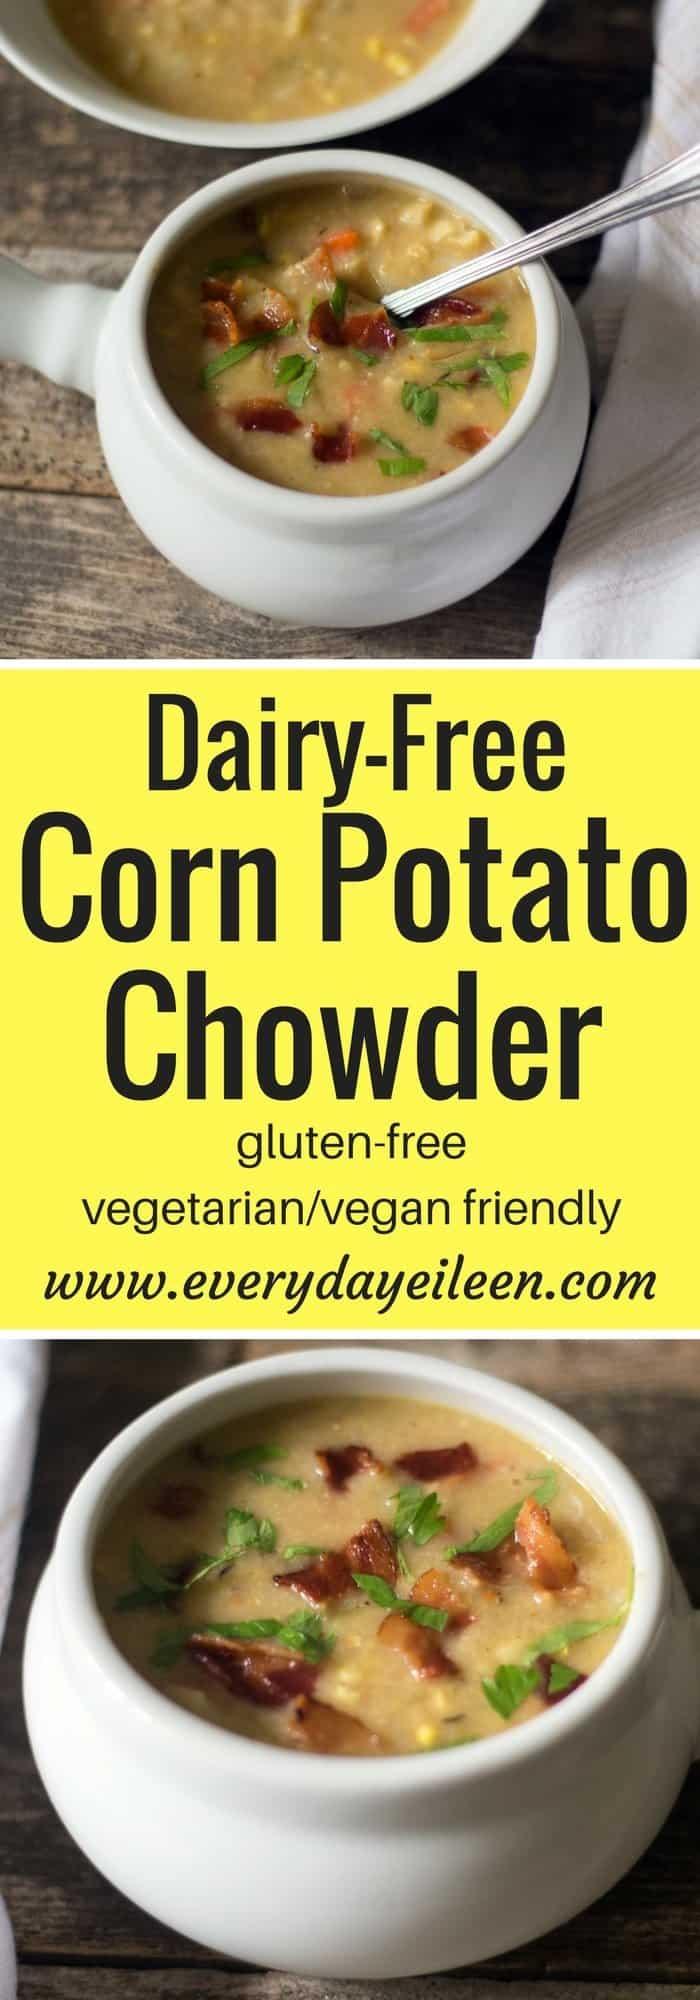 Dairy-Free Corn Potato Chowder